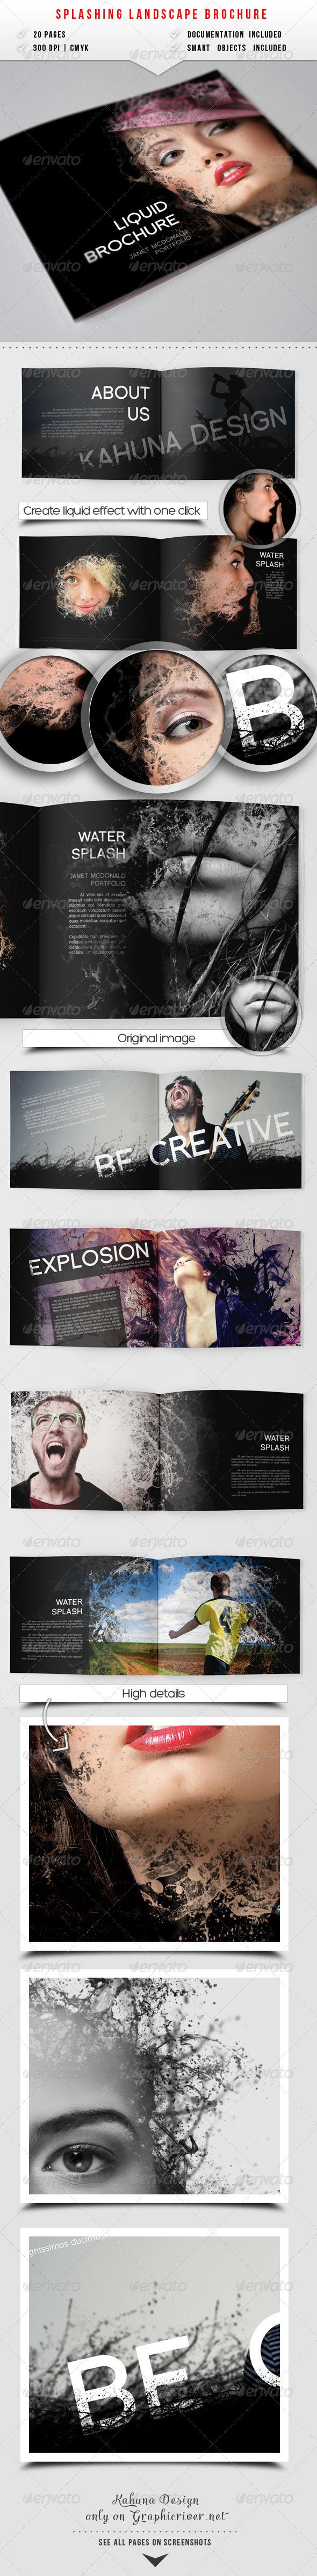 GraphicRiver Splashing Landscape Album 6666104